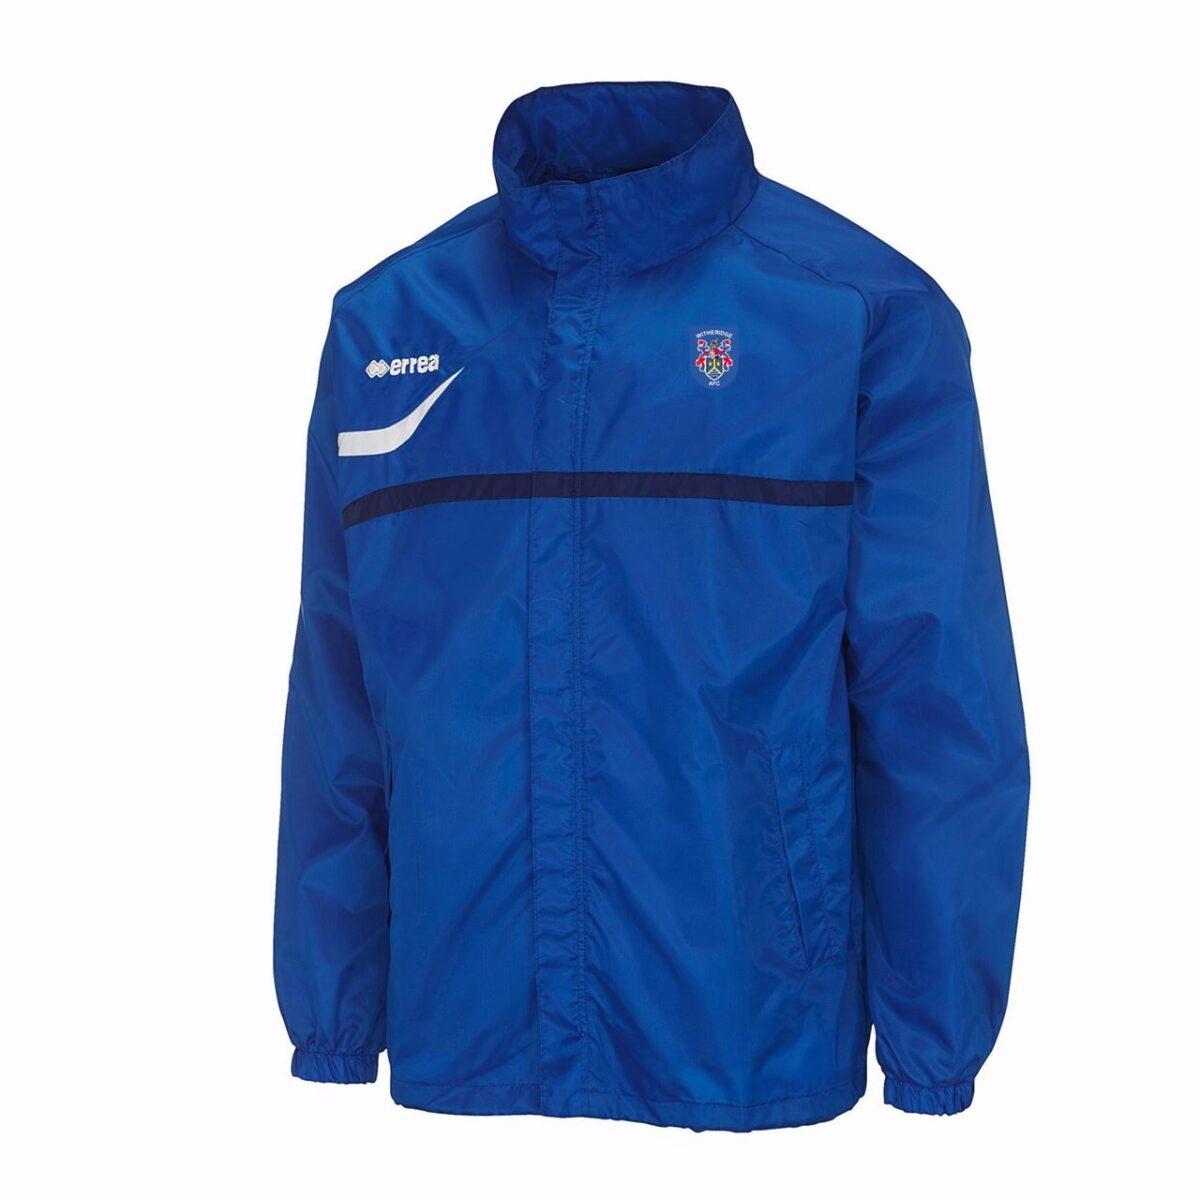 Witheridge Football Club Rain Jacket - Royal - Junior